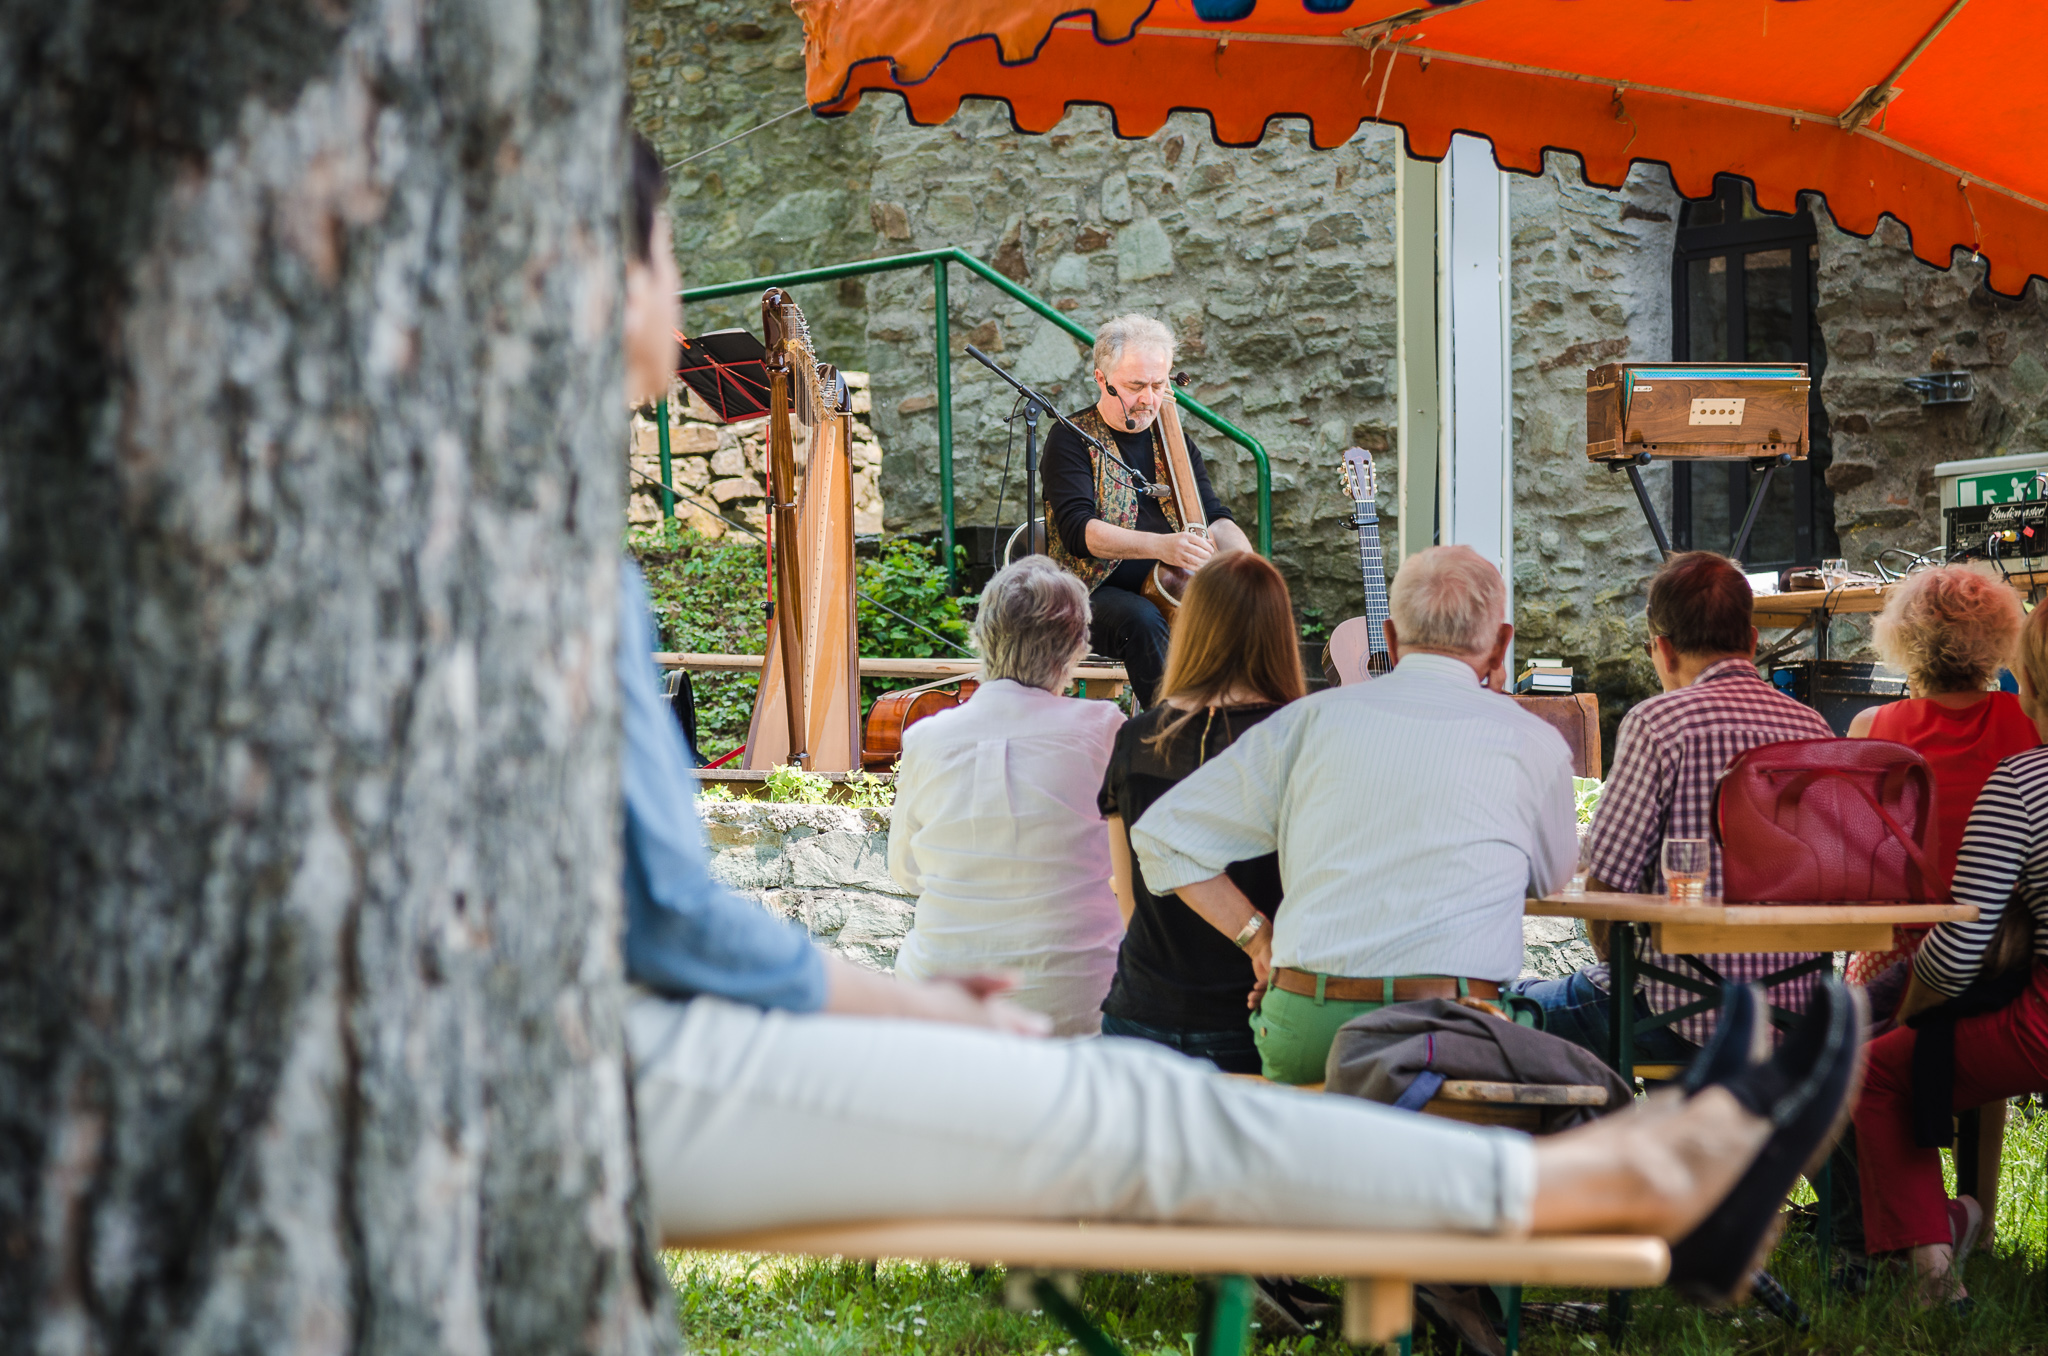 20160605_Wiesbadener_Burgfestspiele_Burg_Sonnenberg-8357.jpg